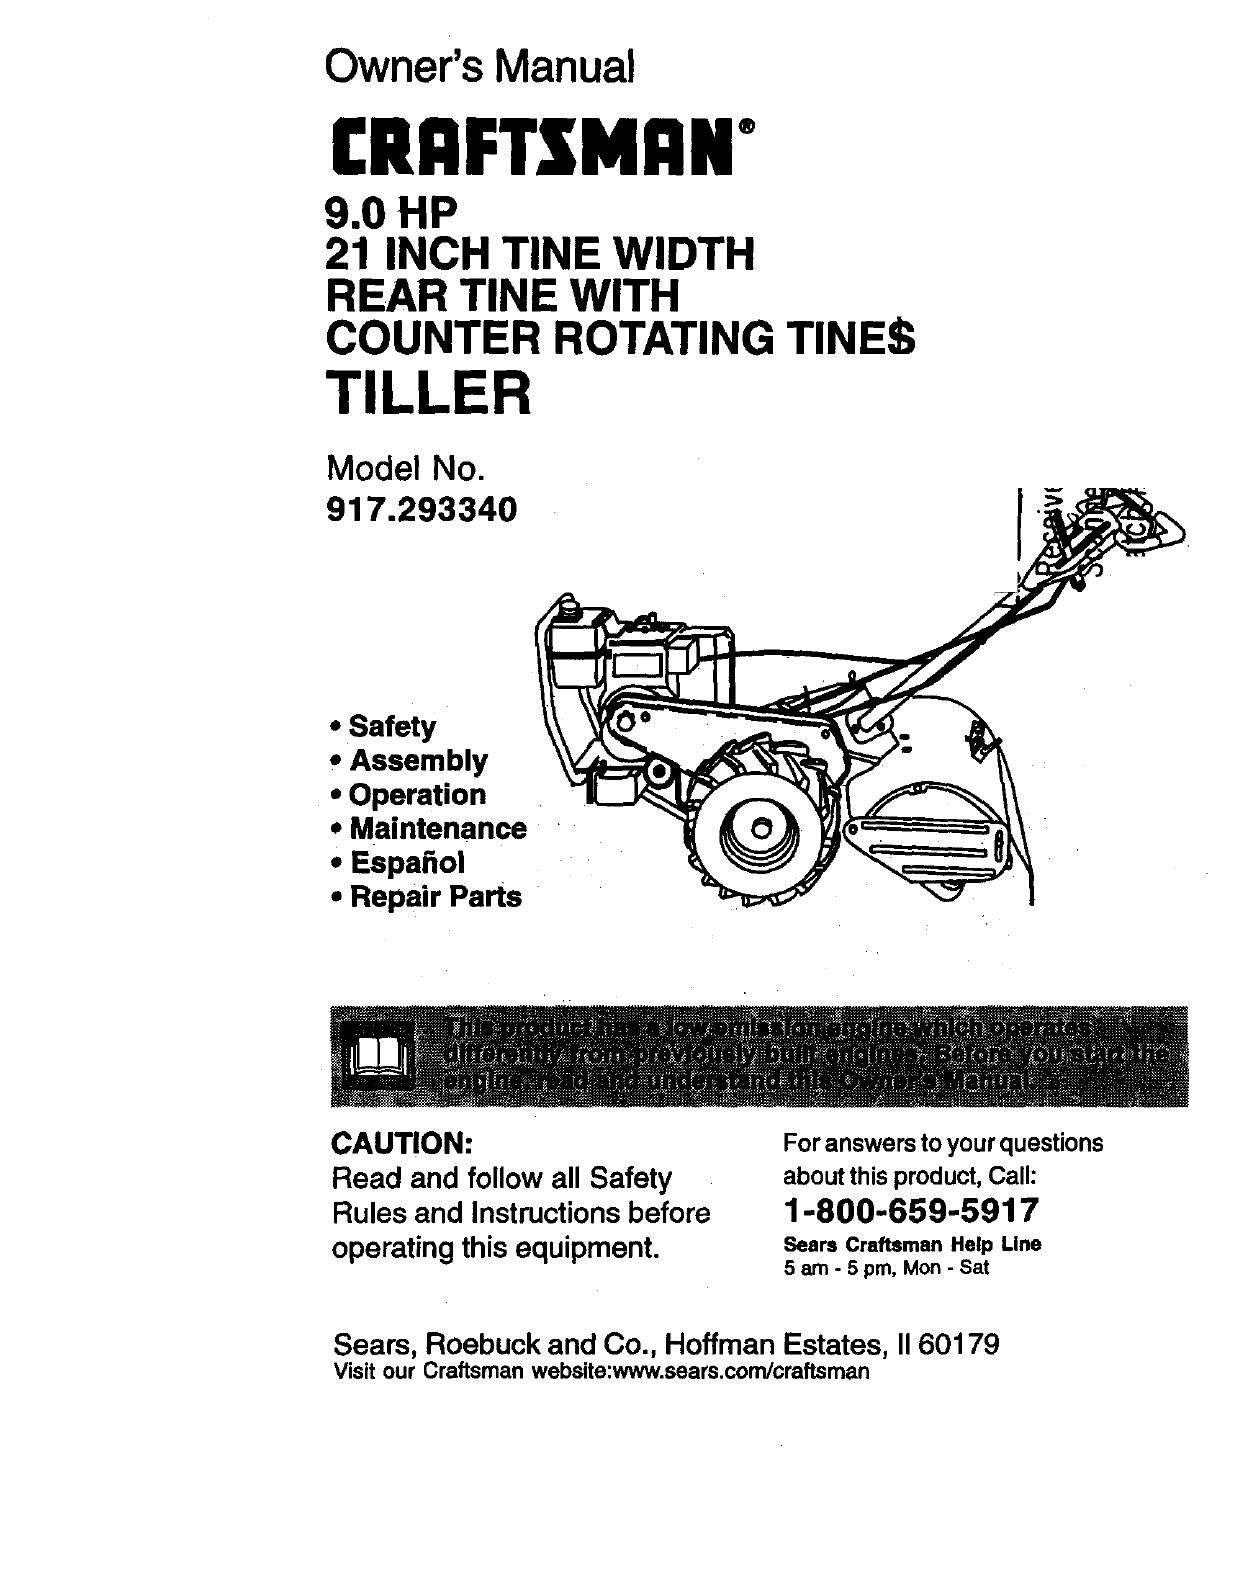 Craftsman 917293340 User Manual 9 0hp Rear Tine Tiller